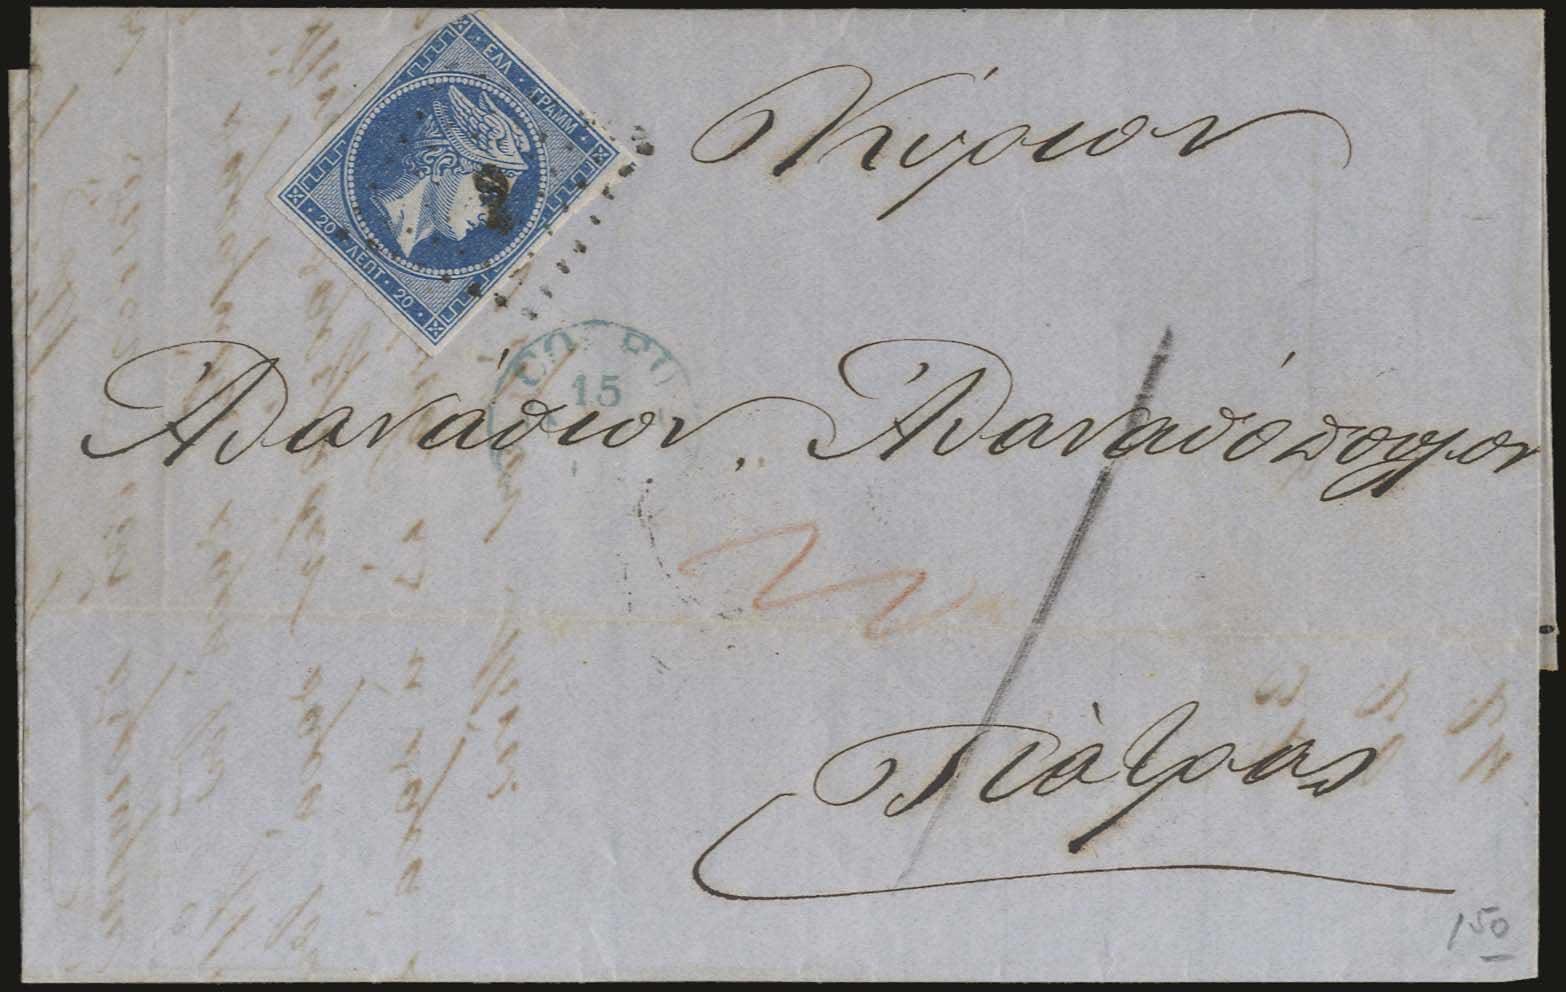 Lot 88 - large hermes head 1862/67 consecutive athens printings -  A. Karamitsos Postal & Live Internet Auction 680 General Philatelic Auction